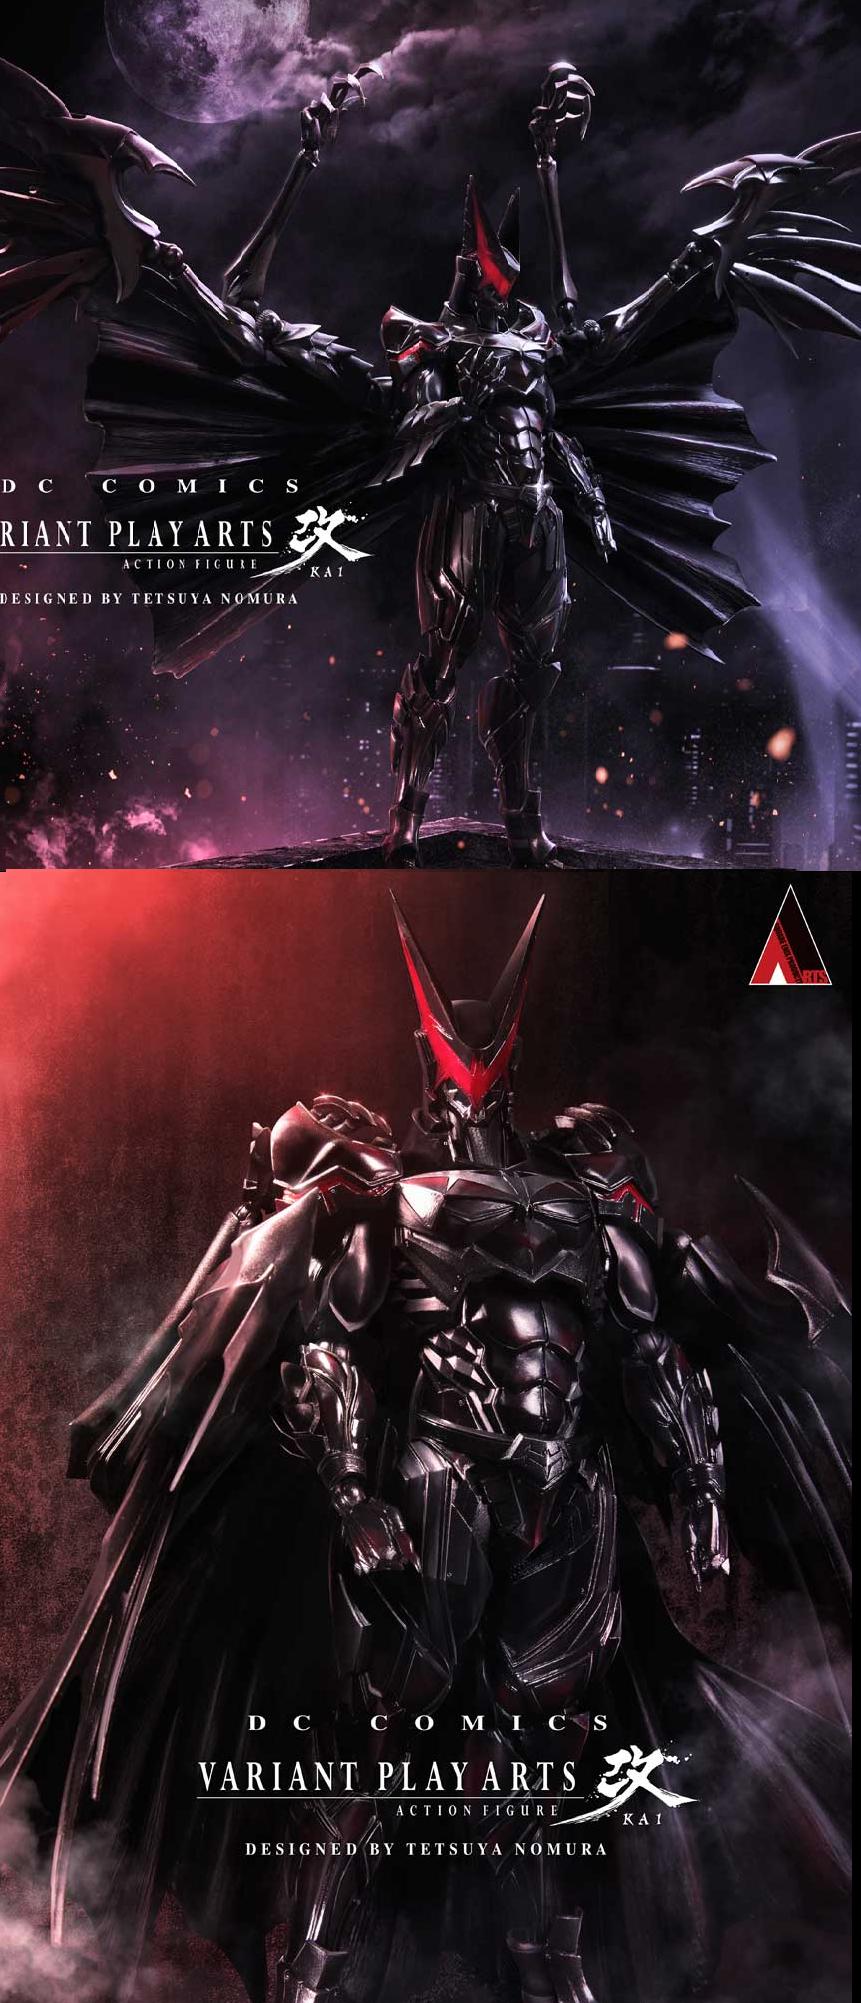 Badass Batman designed by Tetsuya Nomura. Tetsuya Nomura is the designer of Final fantasy.. This looks insane i need it Batman retoast c